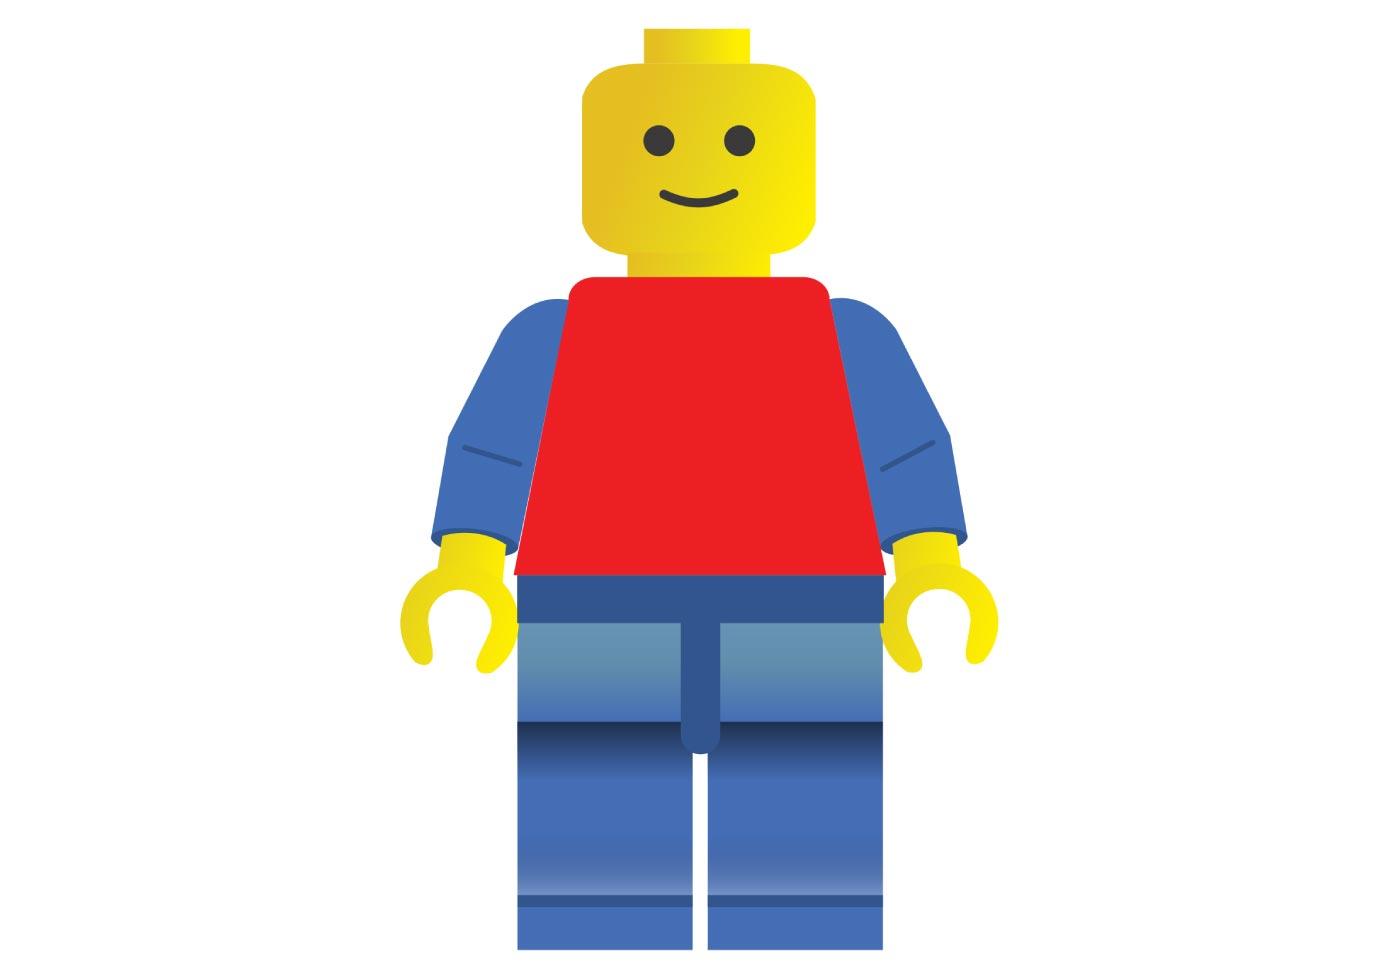 Free SVG Lego Vector Man | Free Vector Art at Vecteezy!